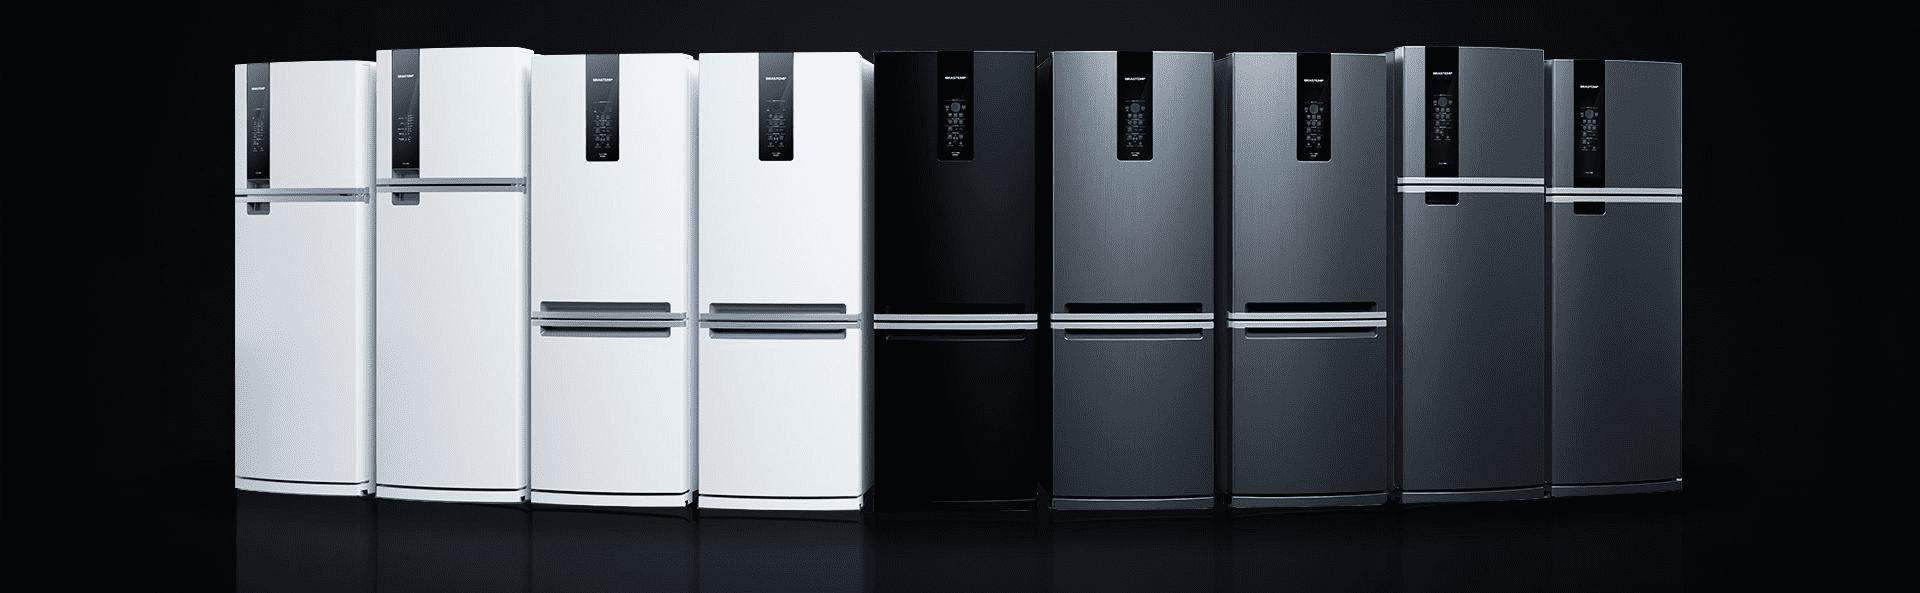 As geladeiras preferidas pelas consumidoras no segmento de alta capacidade